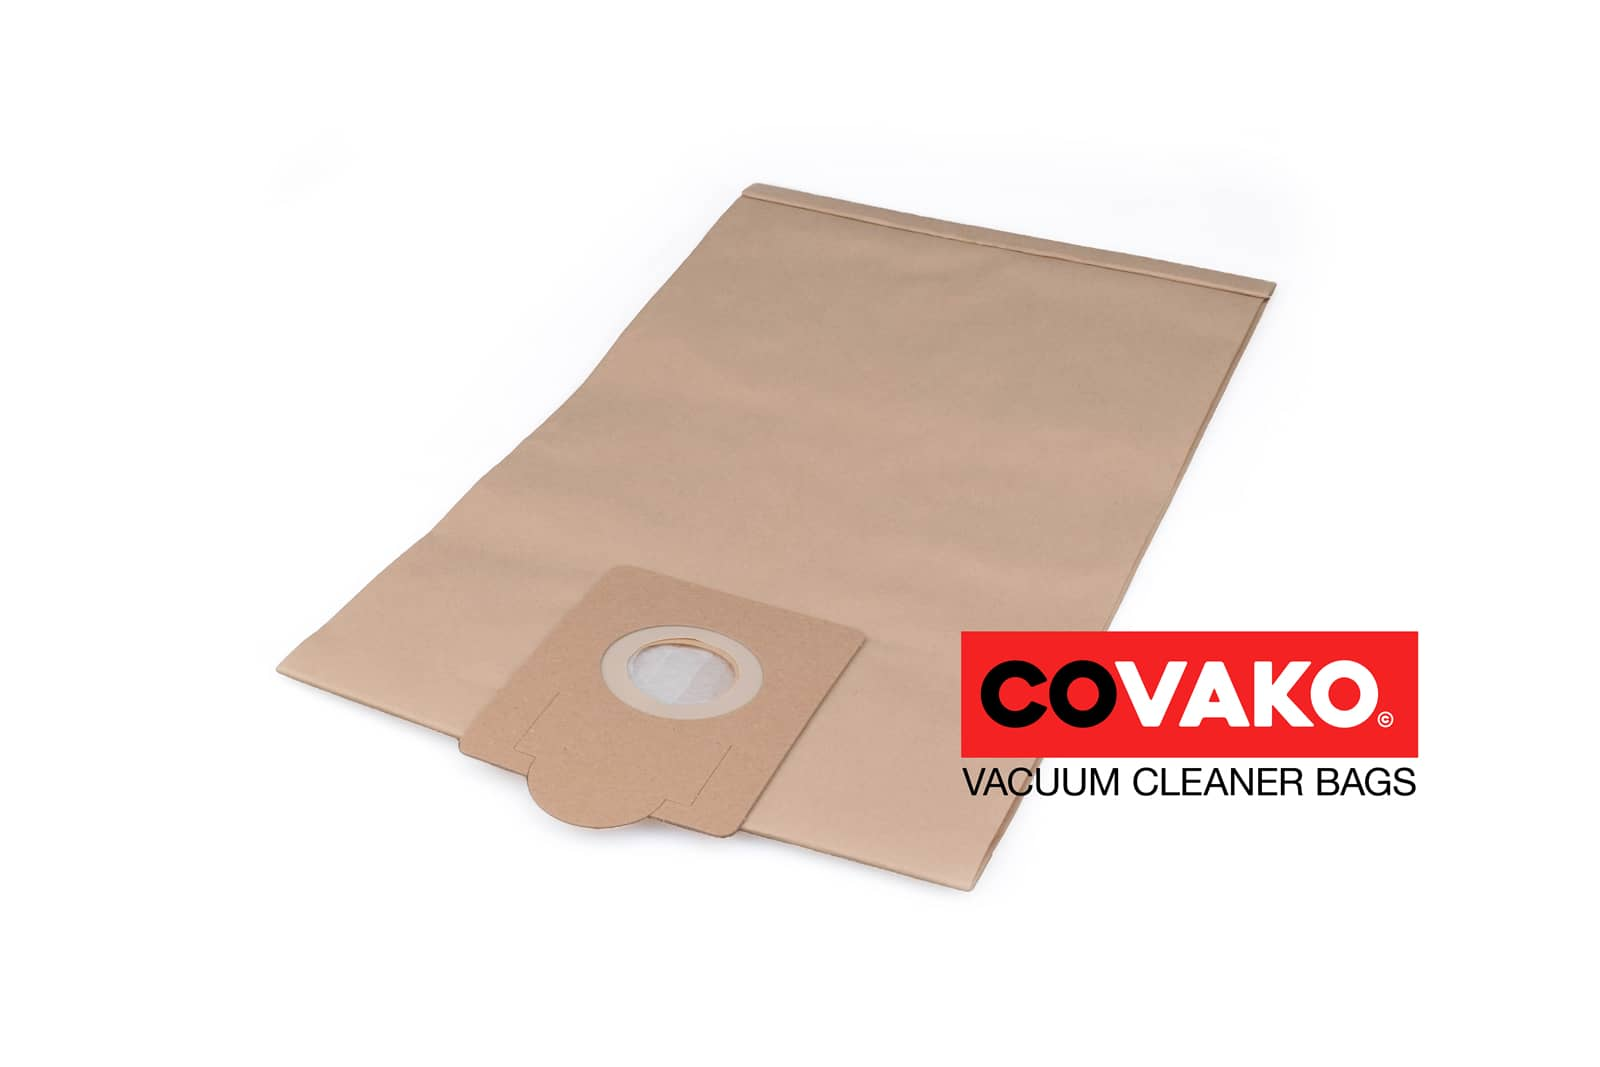 Clean a la Card K103200941 / Paper - Clean a la Card vacuum cleaner bags